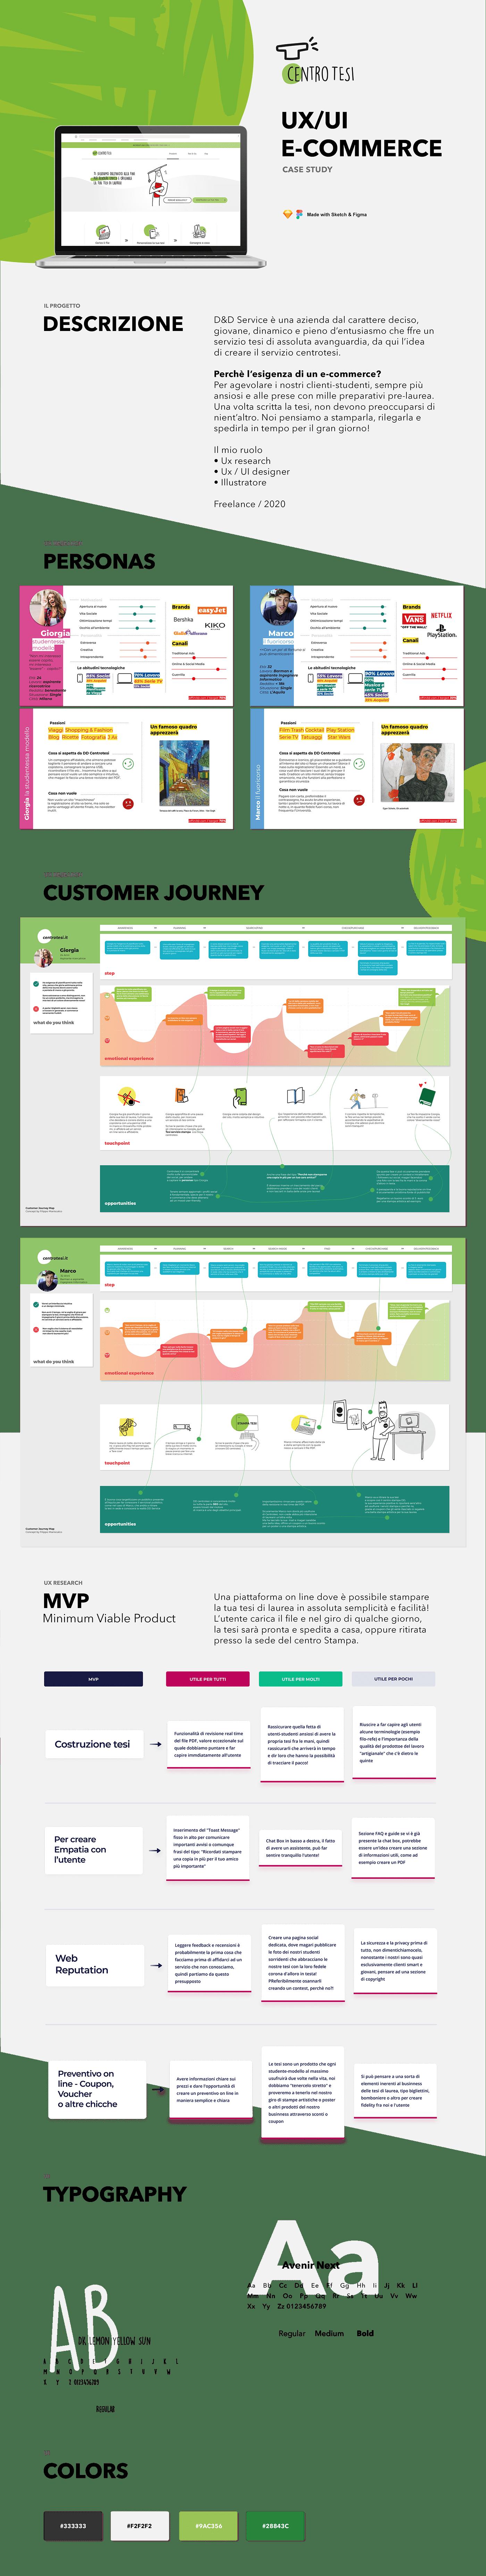 Centro Tesi E COMMERCE Filippo Maniscalco roma UX Designer UX UI DESign